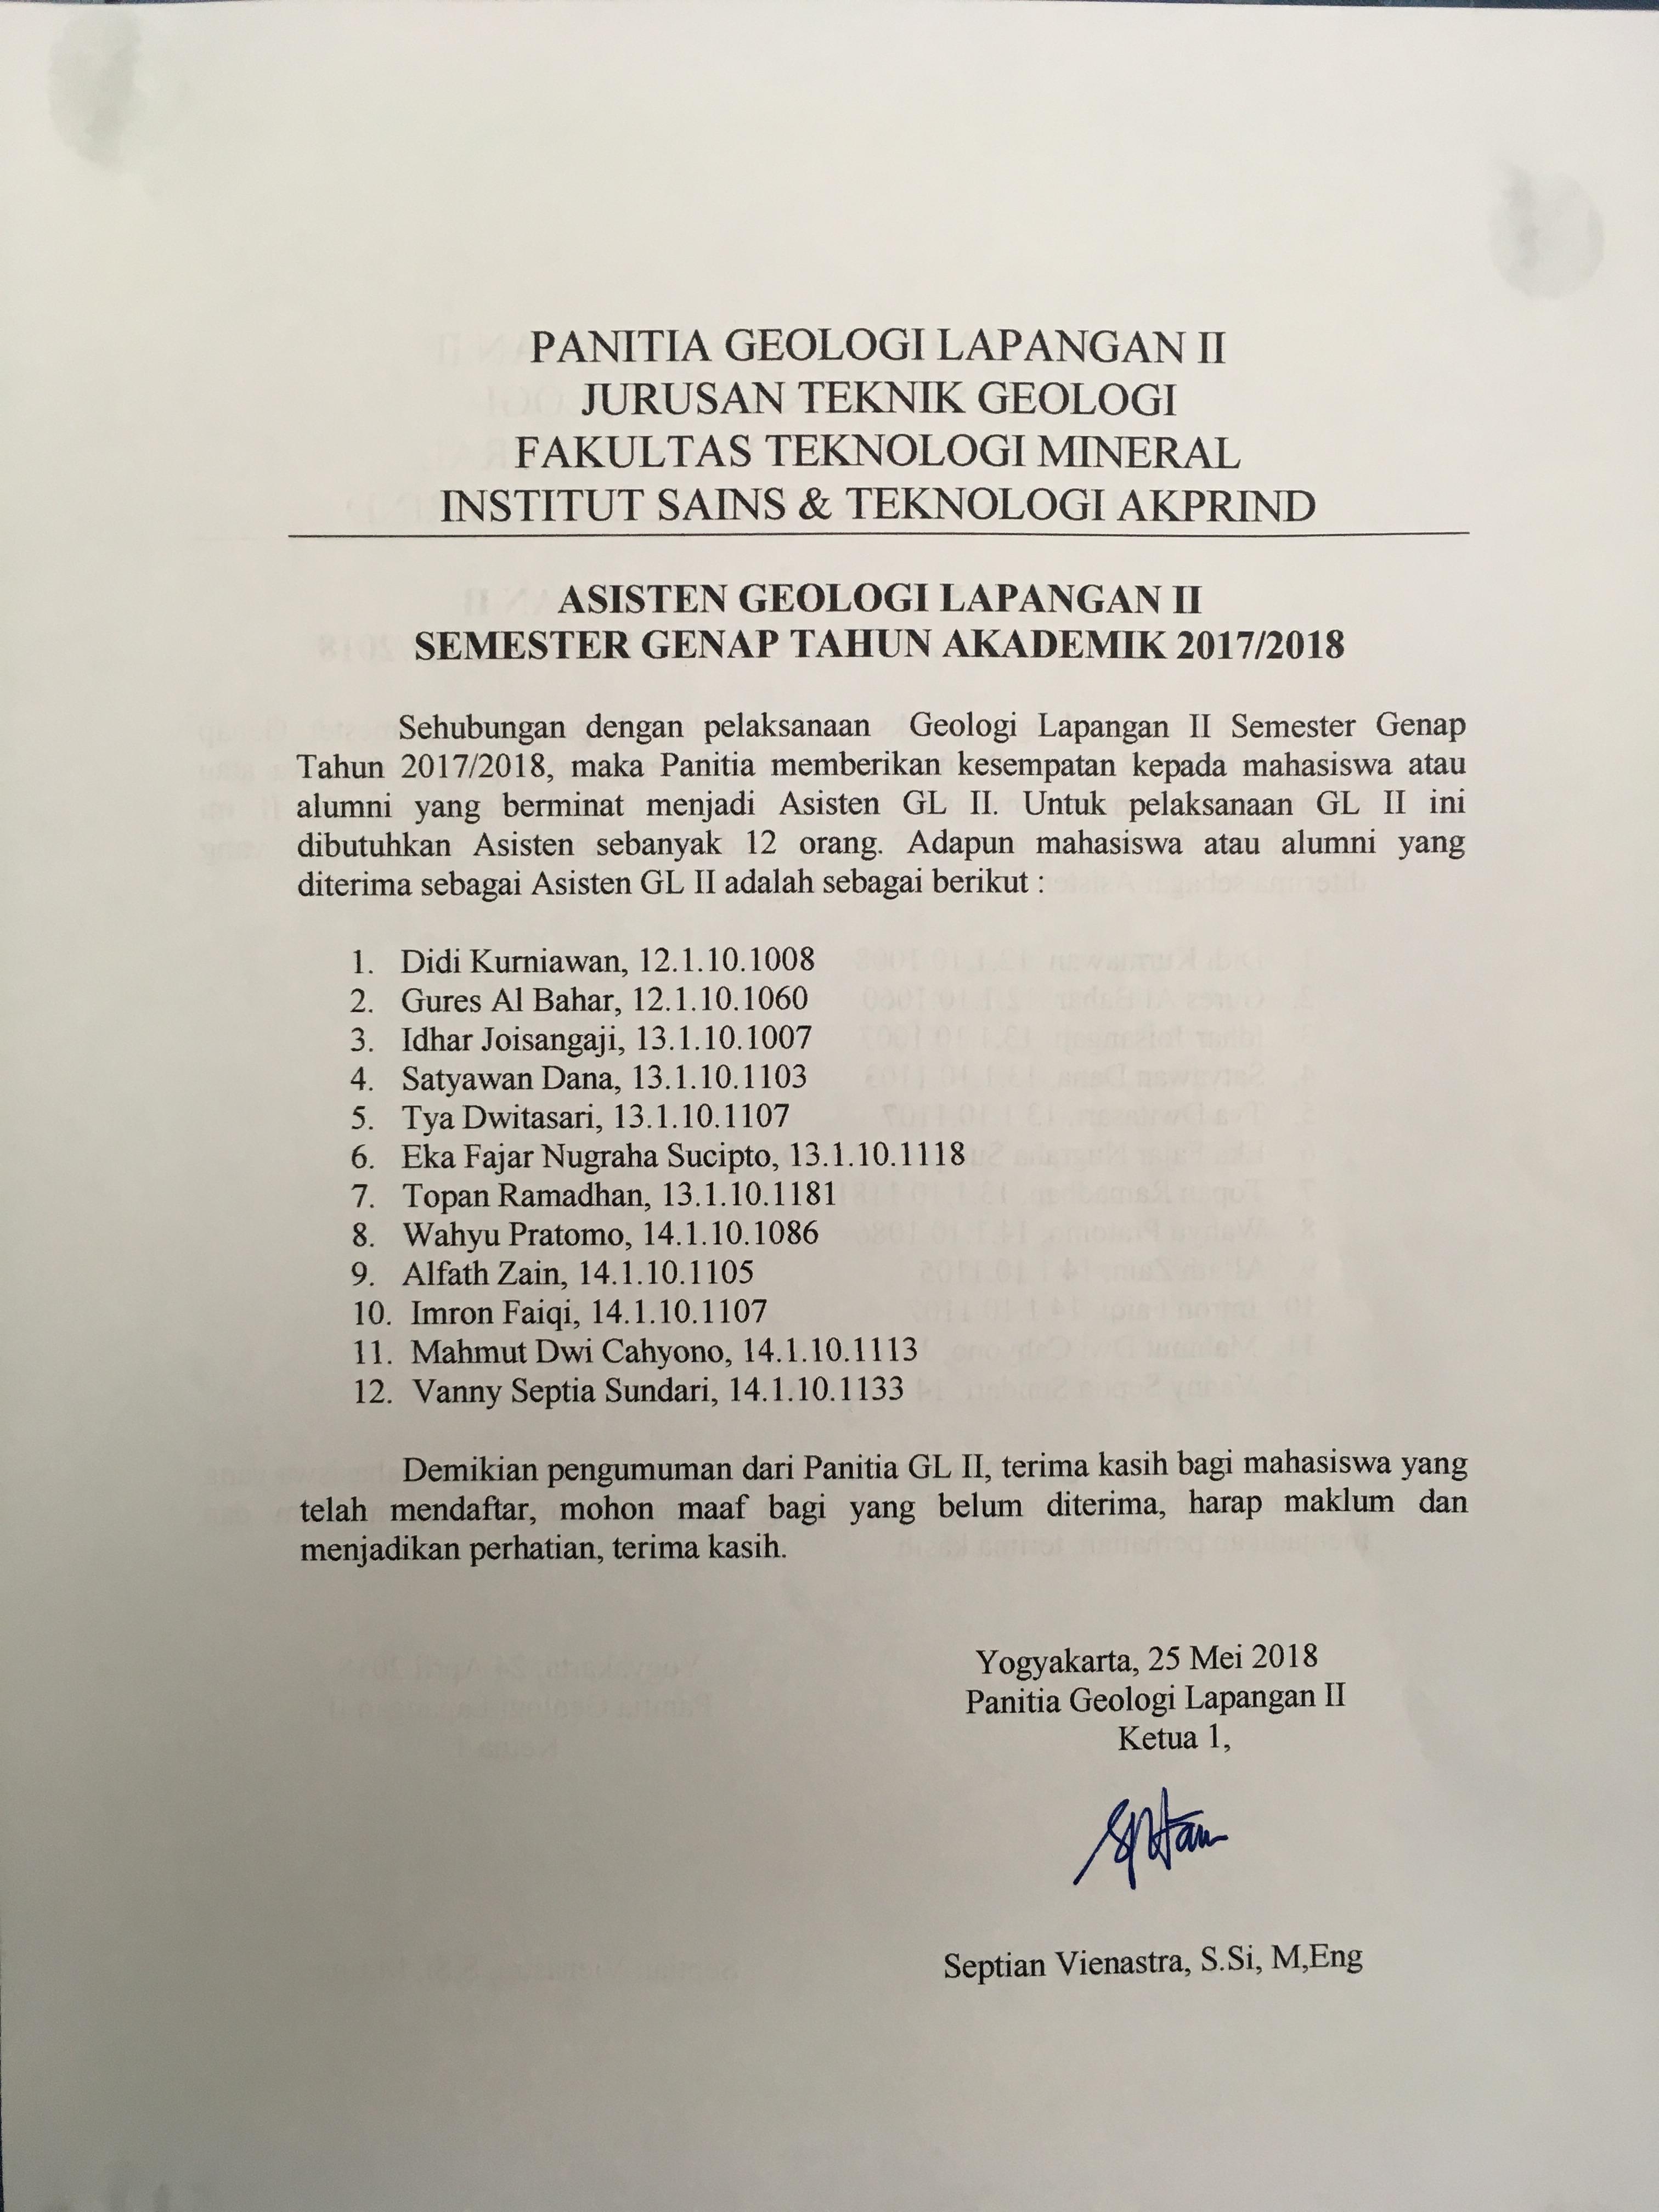 PENGUMUMAN Daftar Asisten yang diterima sebagai ASISTEN GL 2 Jurusan Teknik Geologi